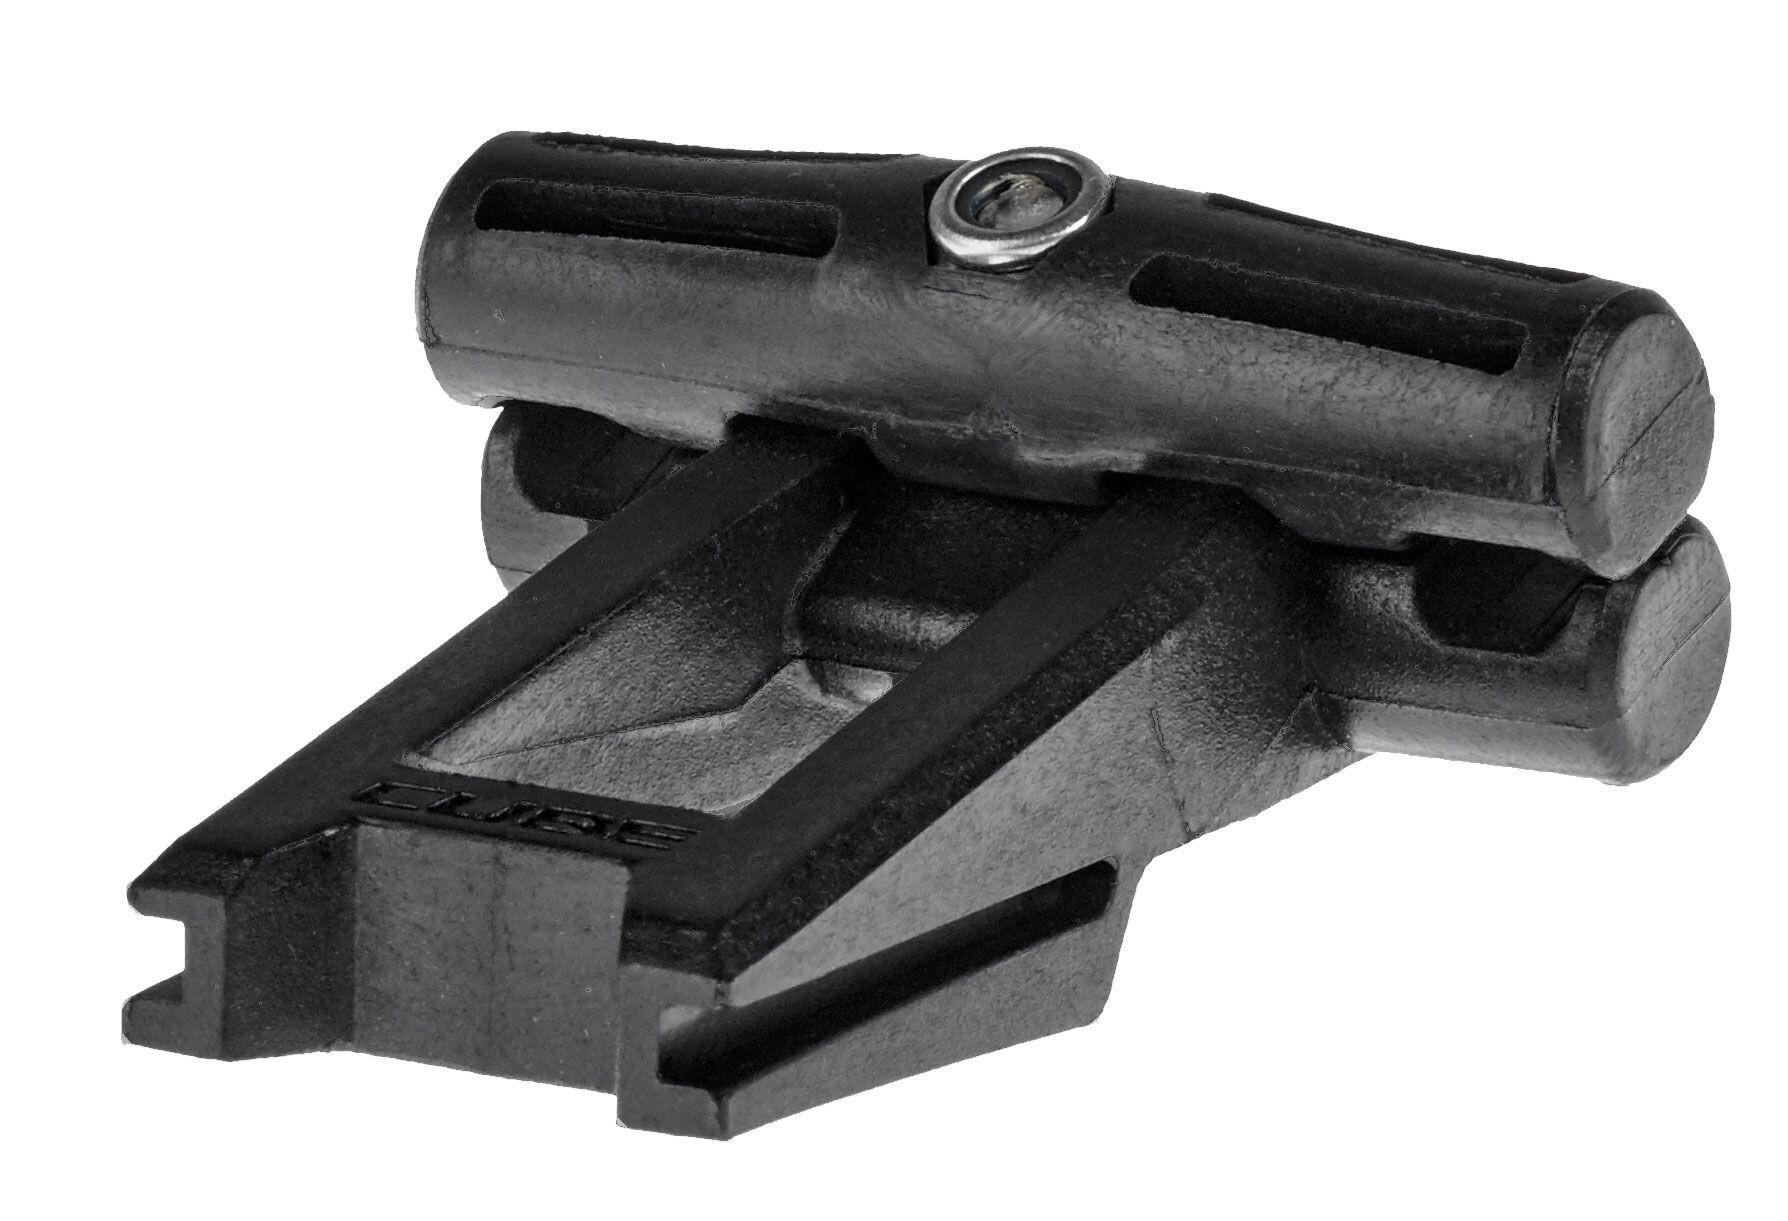 Cube sadeladapter Click, black   Bags accessories